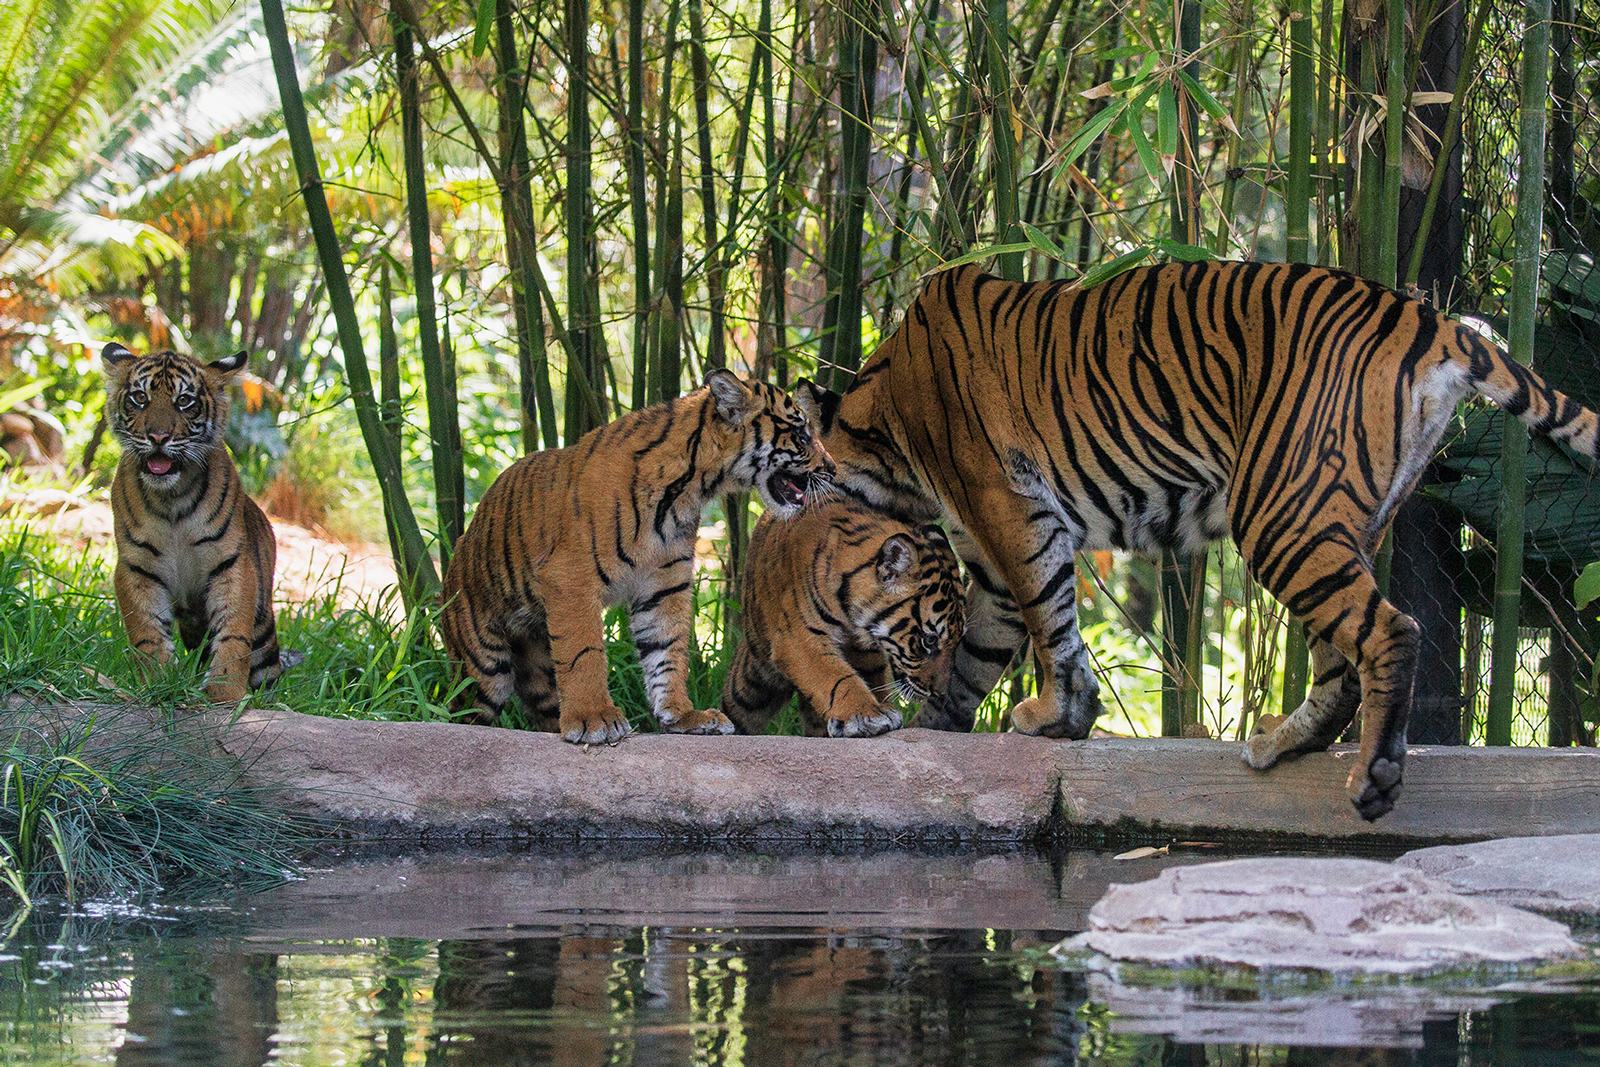 Tiger Cubs Explore New Habitat at the San Diego Zoo Safari Park